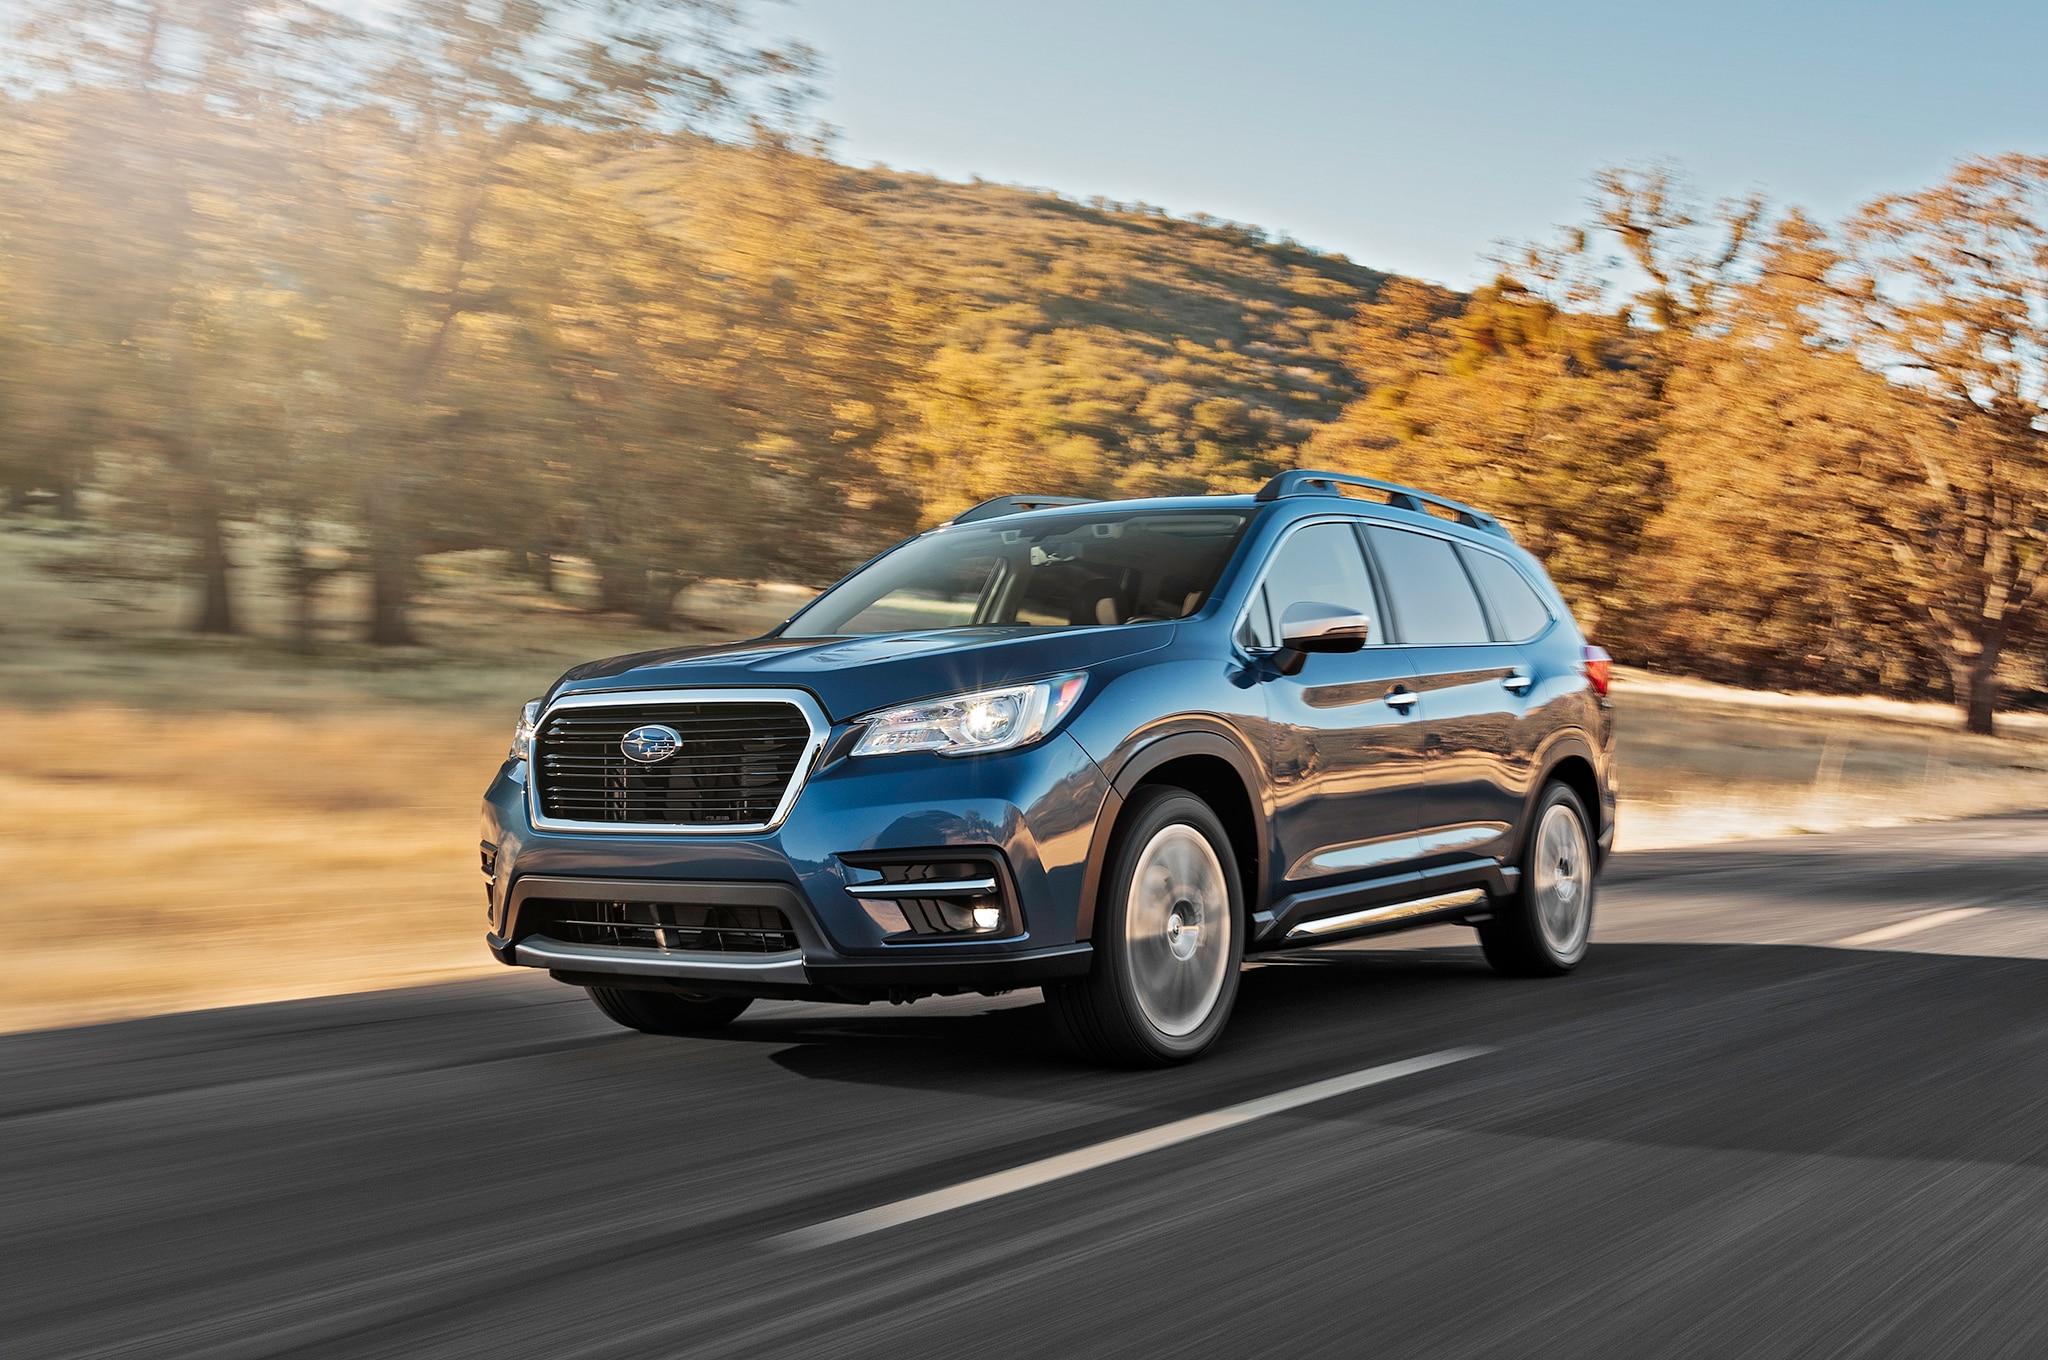 2019 Subaru Ascent Front Three Quarter In Motion 03